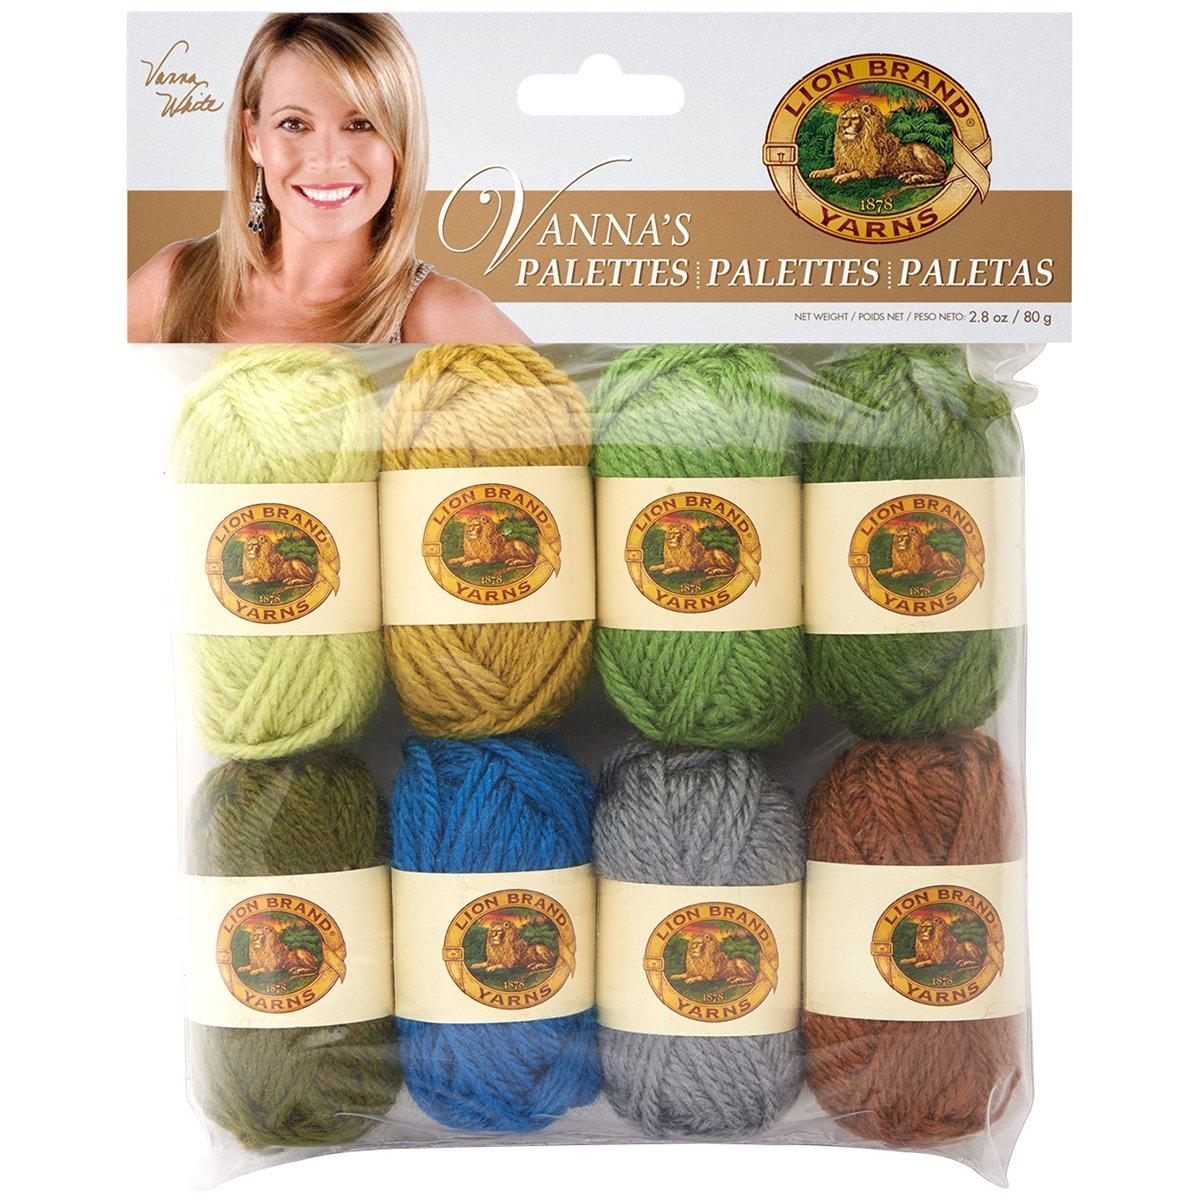 Lion Brand Yarn 865-204 Vanna's Palettes Yarn, Charming